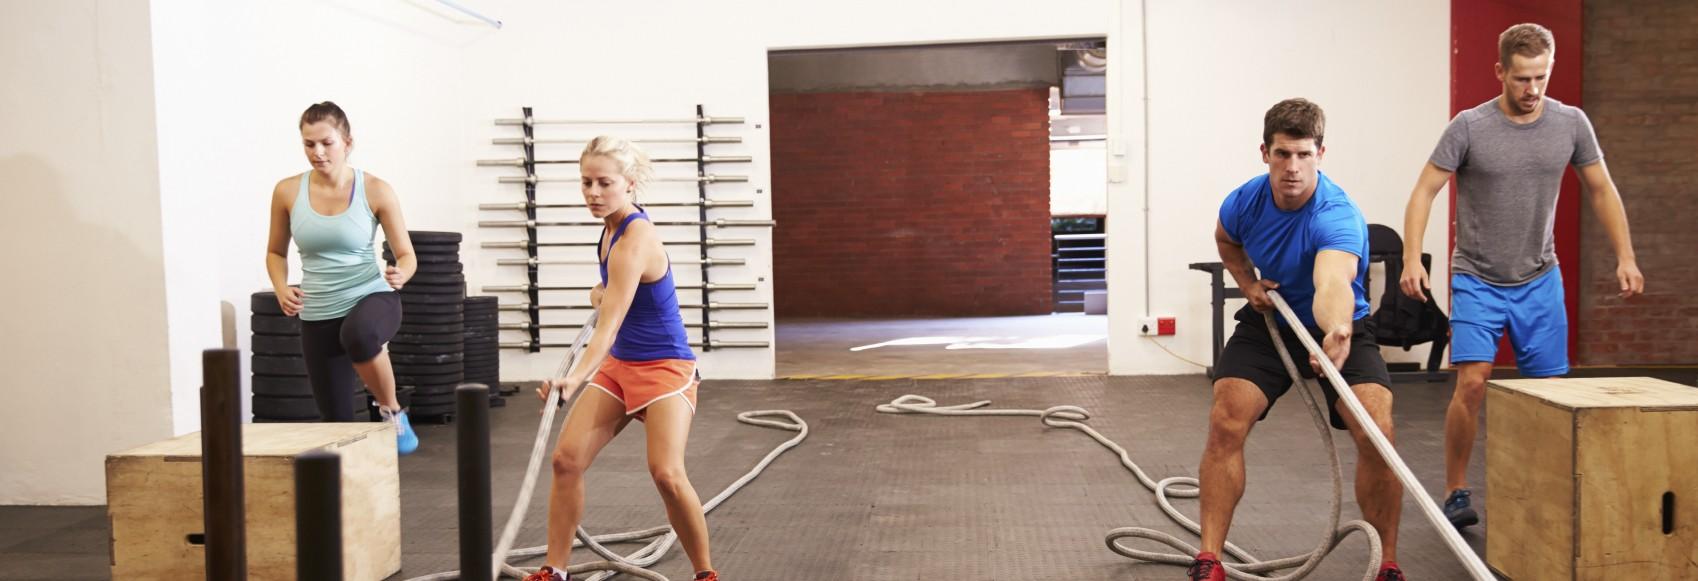 total body circuit training